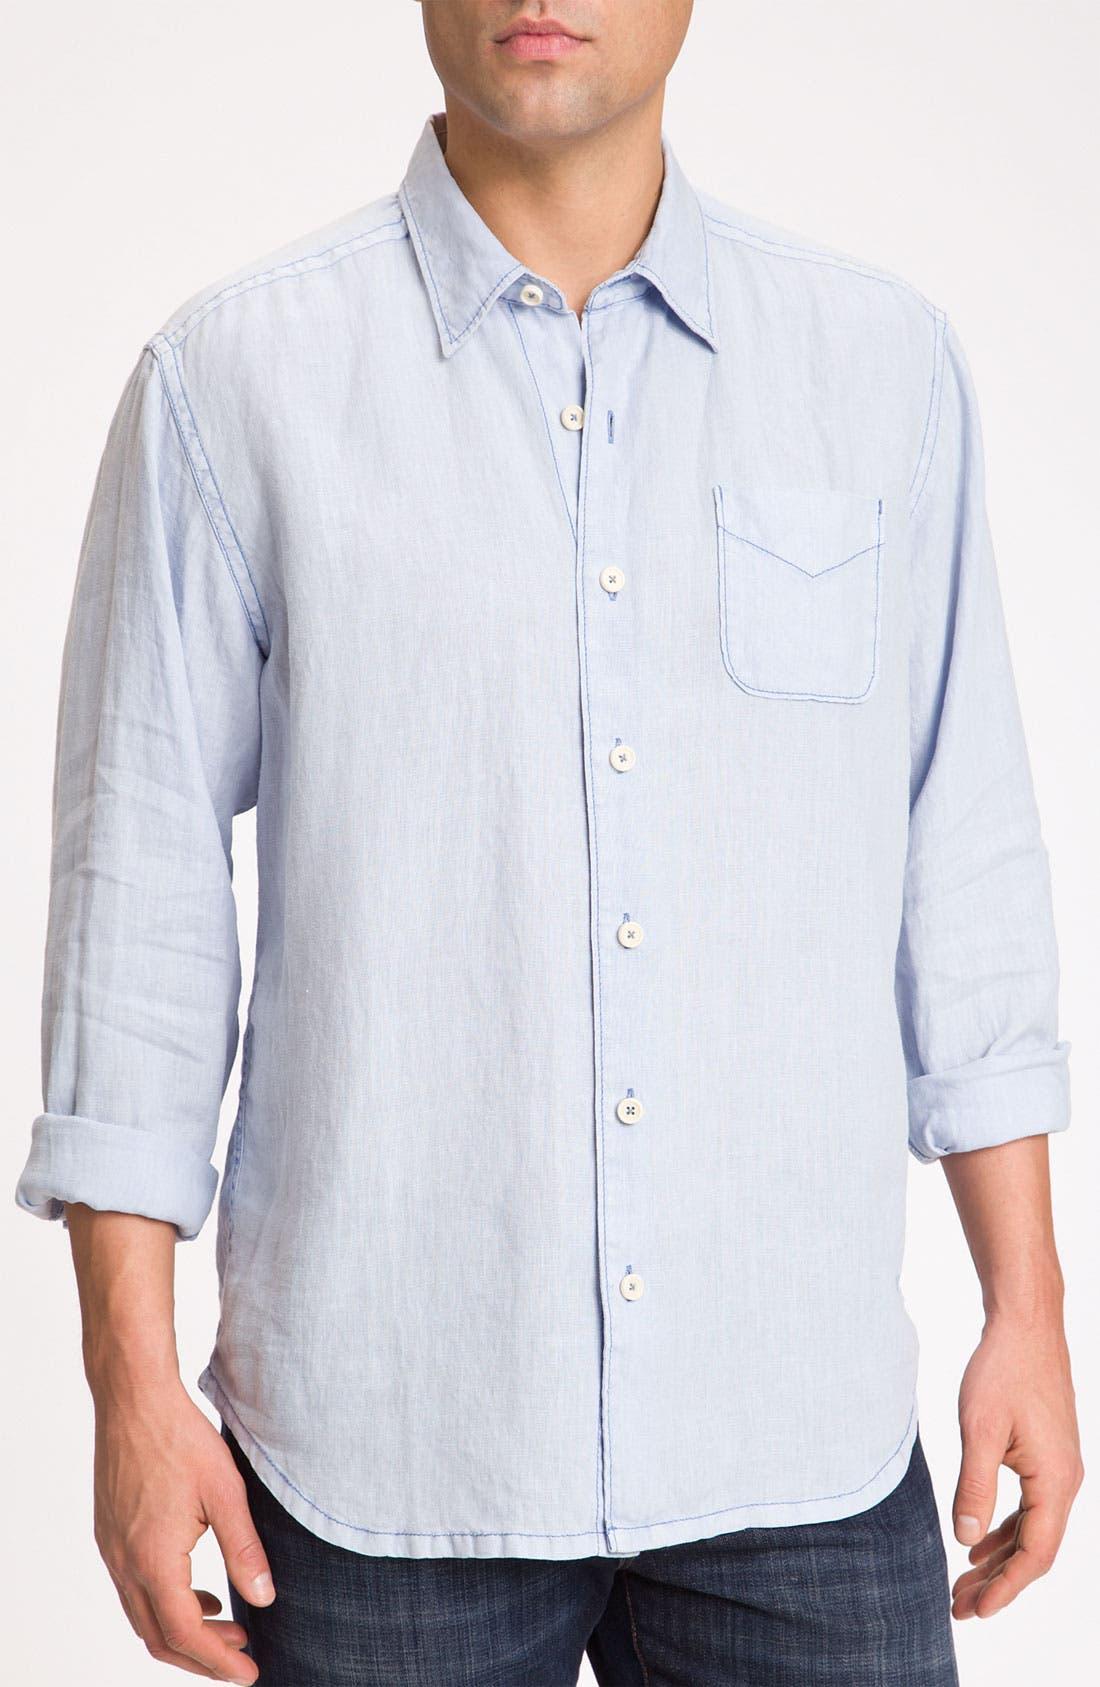 Alternate Image 1 Selected - Tommy Bahama 'Beachy Breezer' Linen Sport Shirt (Big & Tall)